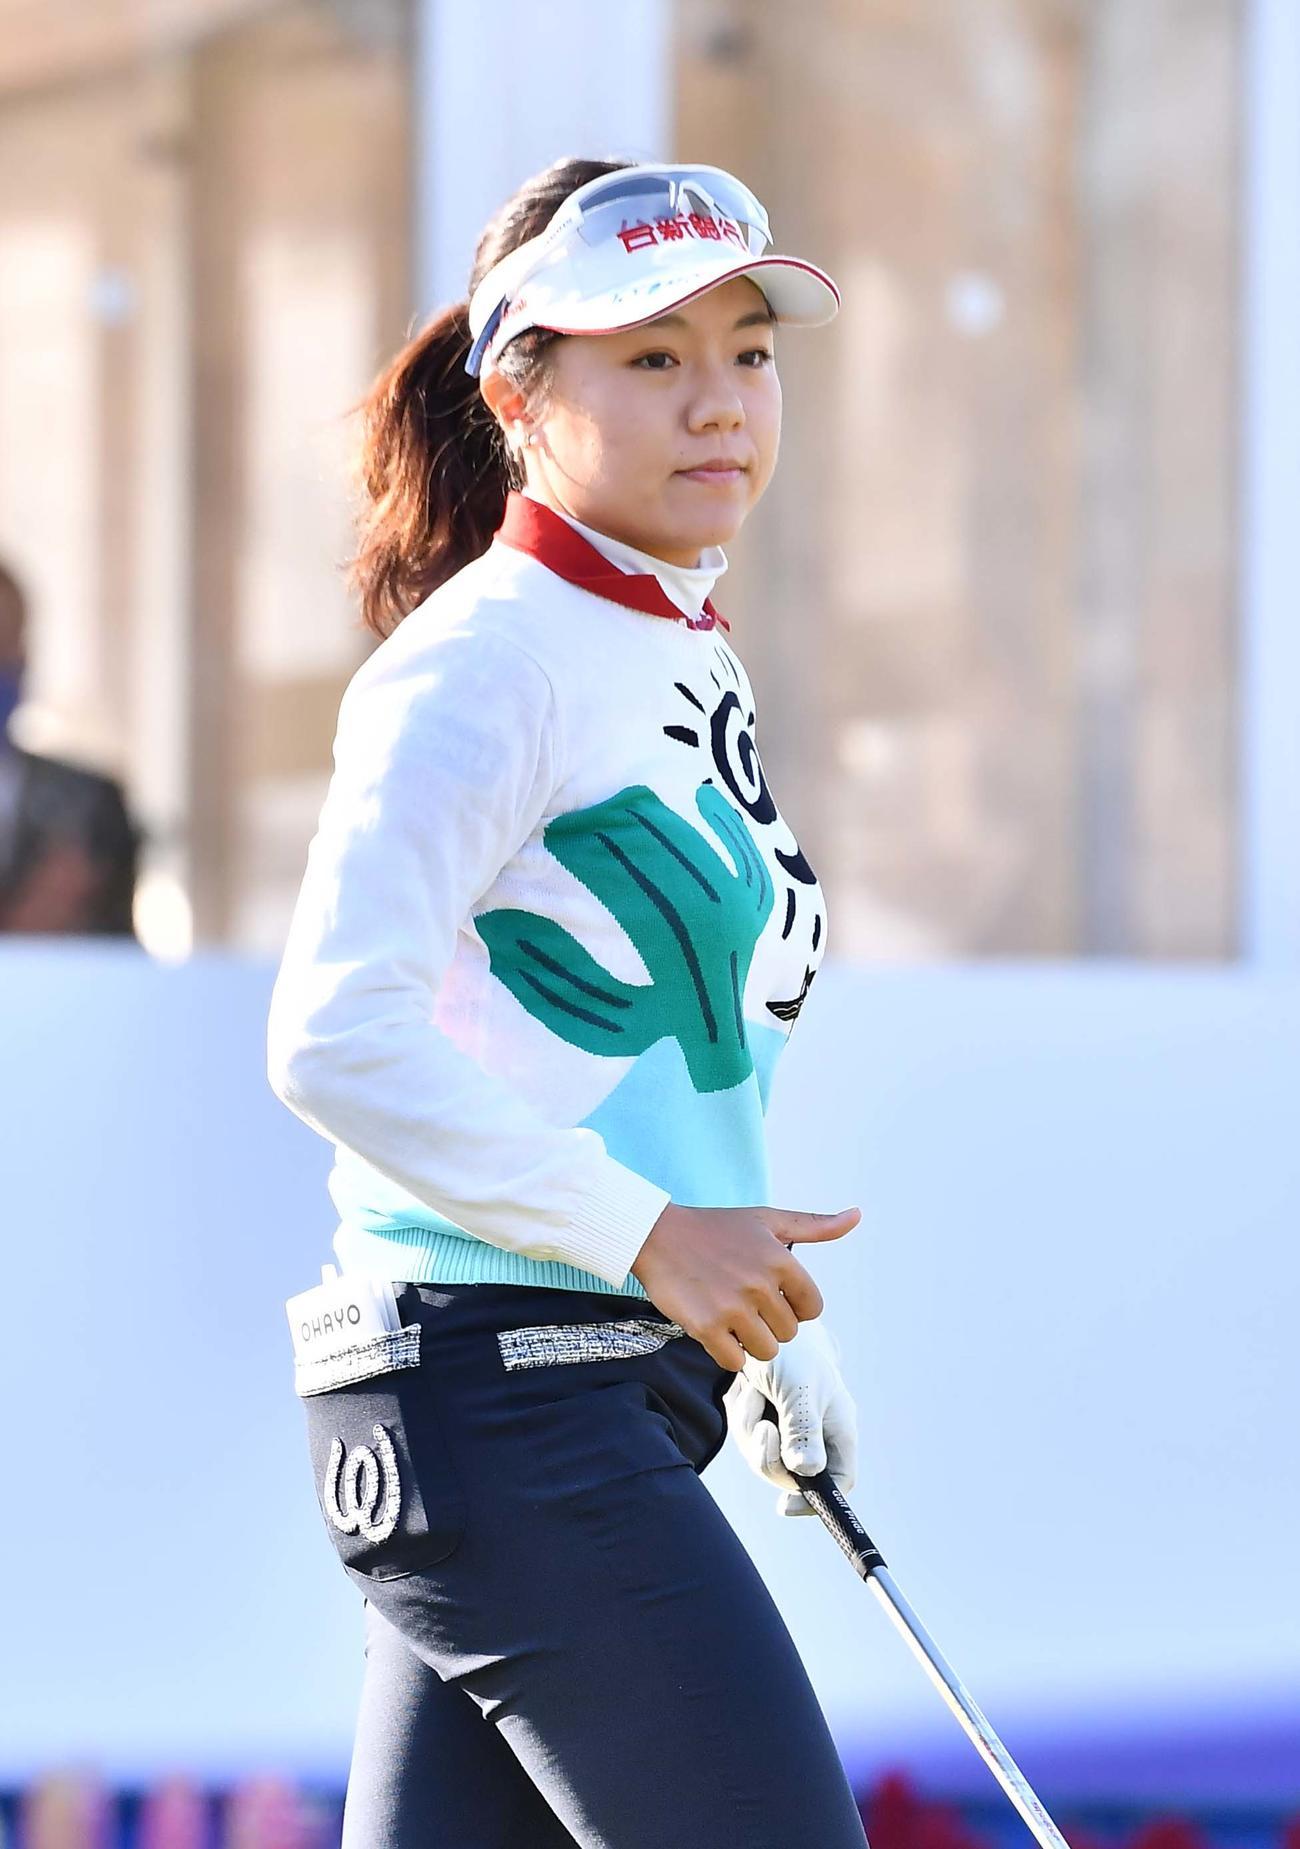 https://www.nikkansports.com/sports/golf/news/img/202103270000223-w1300_7.jpg